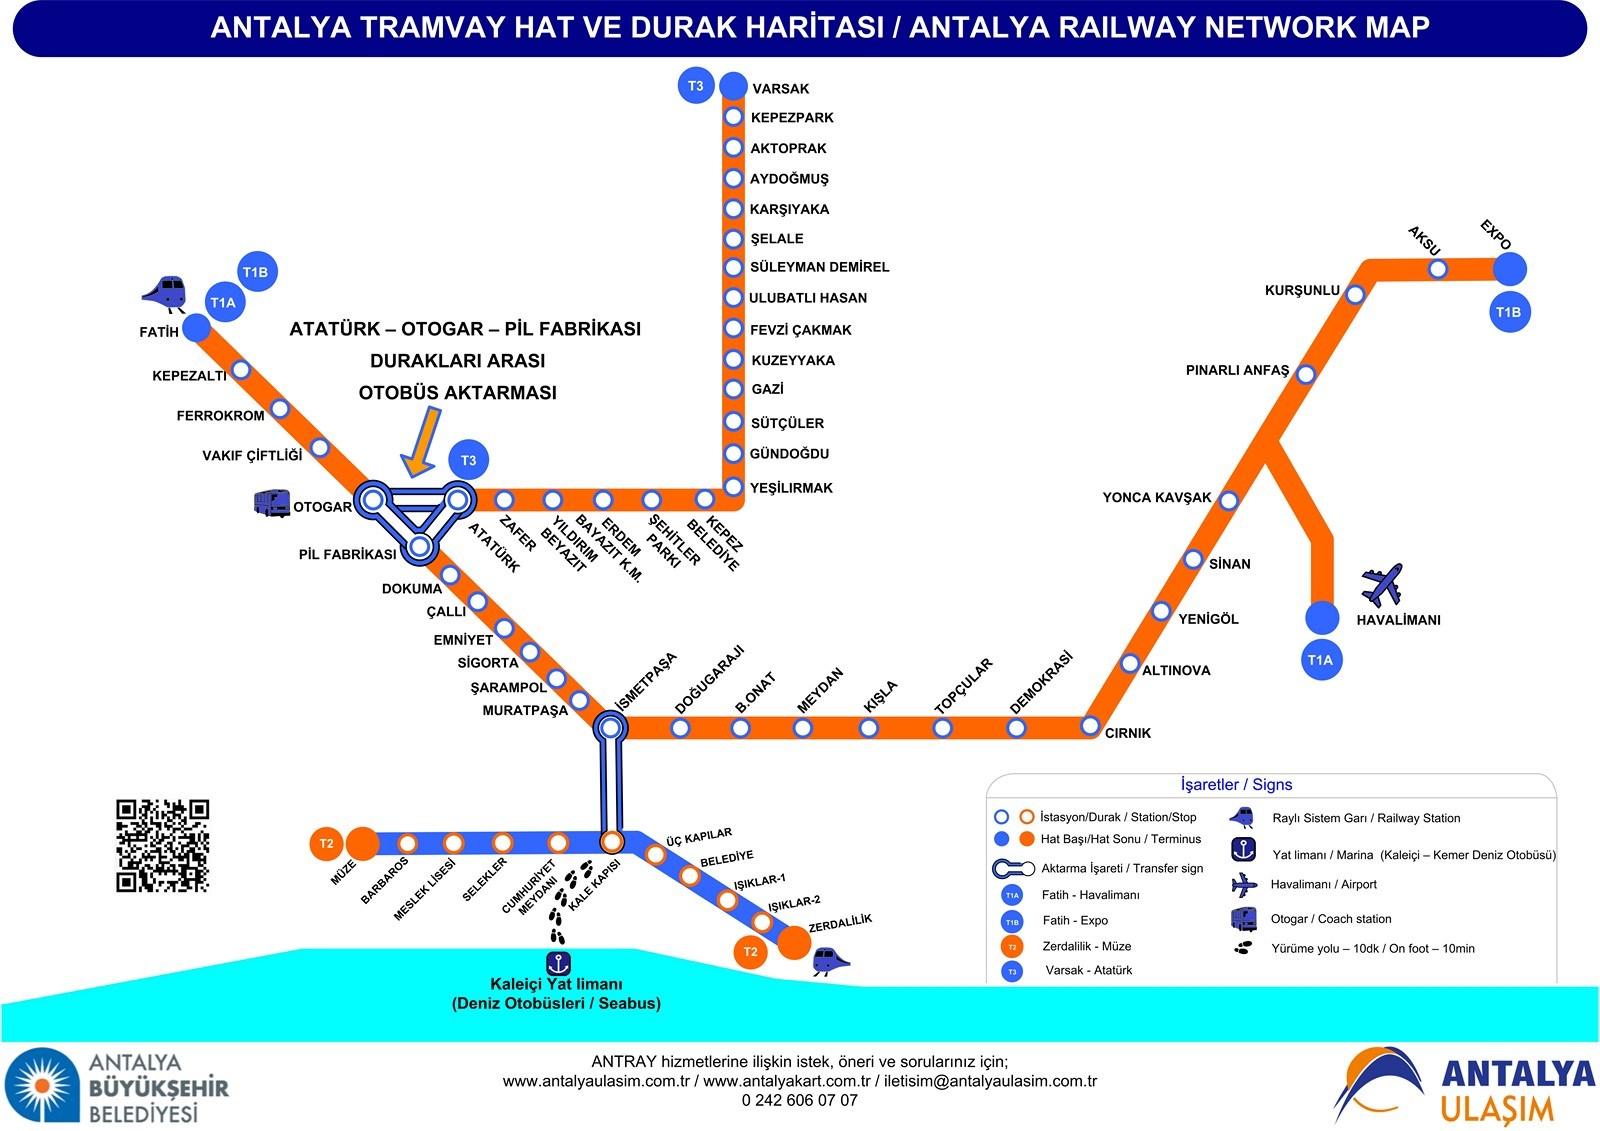 Как добраться до Калеичи в Анталии на трамвае